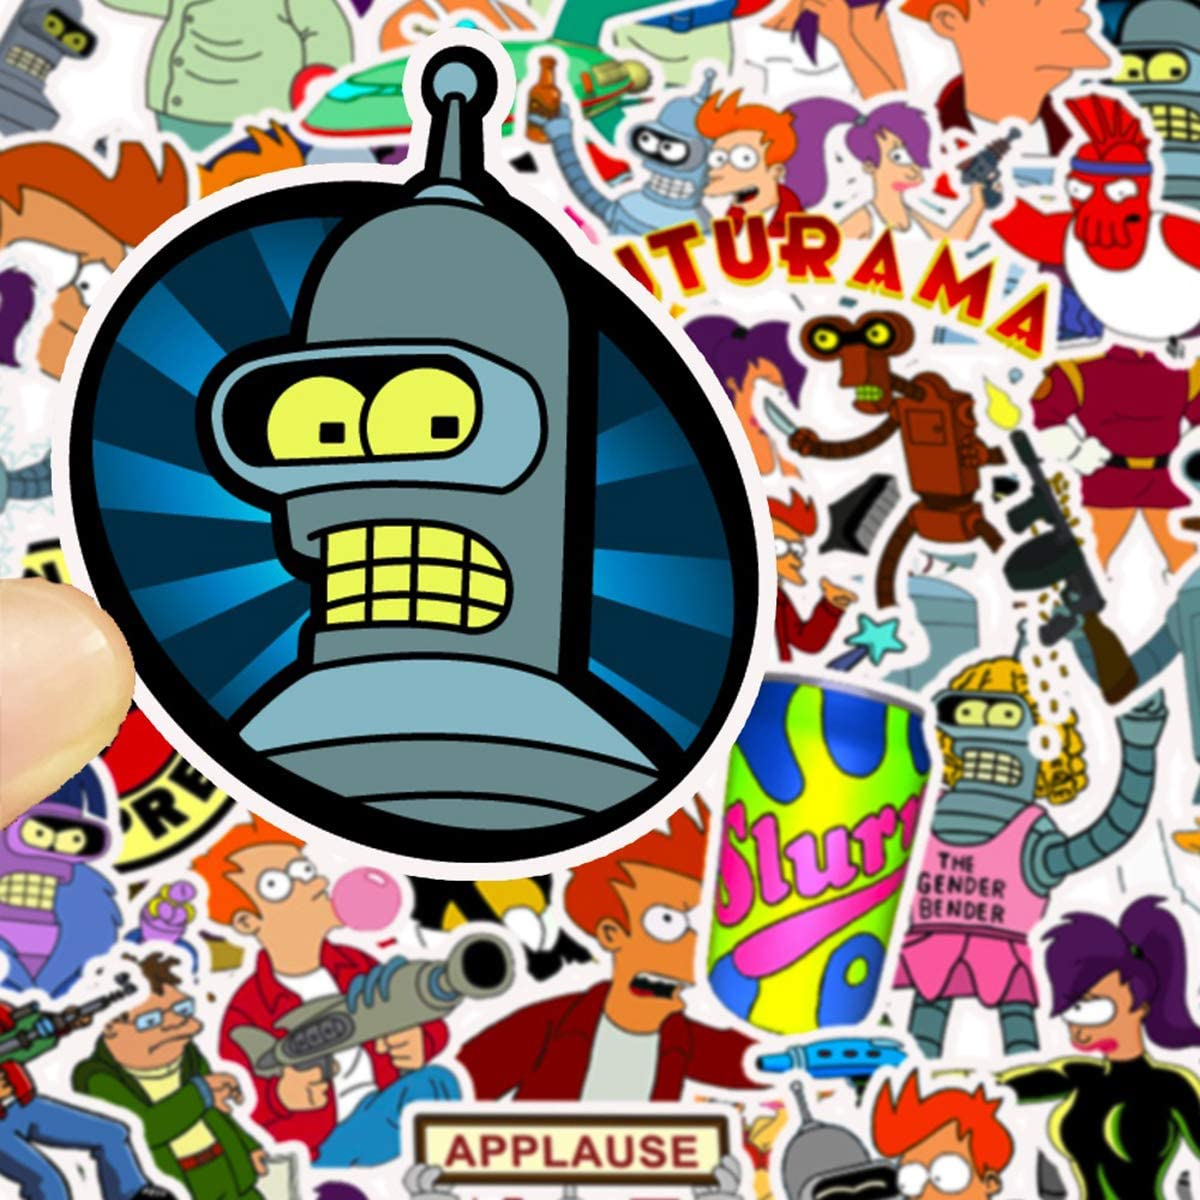 Futurama Themed Fry Stickers Car Laptop Helmet Luggage Vintage Skateboard Wall Decor Gift for Kids Futurama TV Series Decal Stickers Cartoon Waterproof Philip J